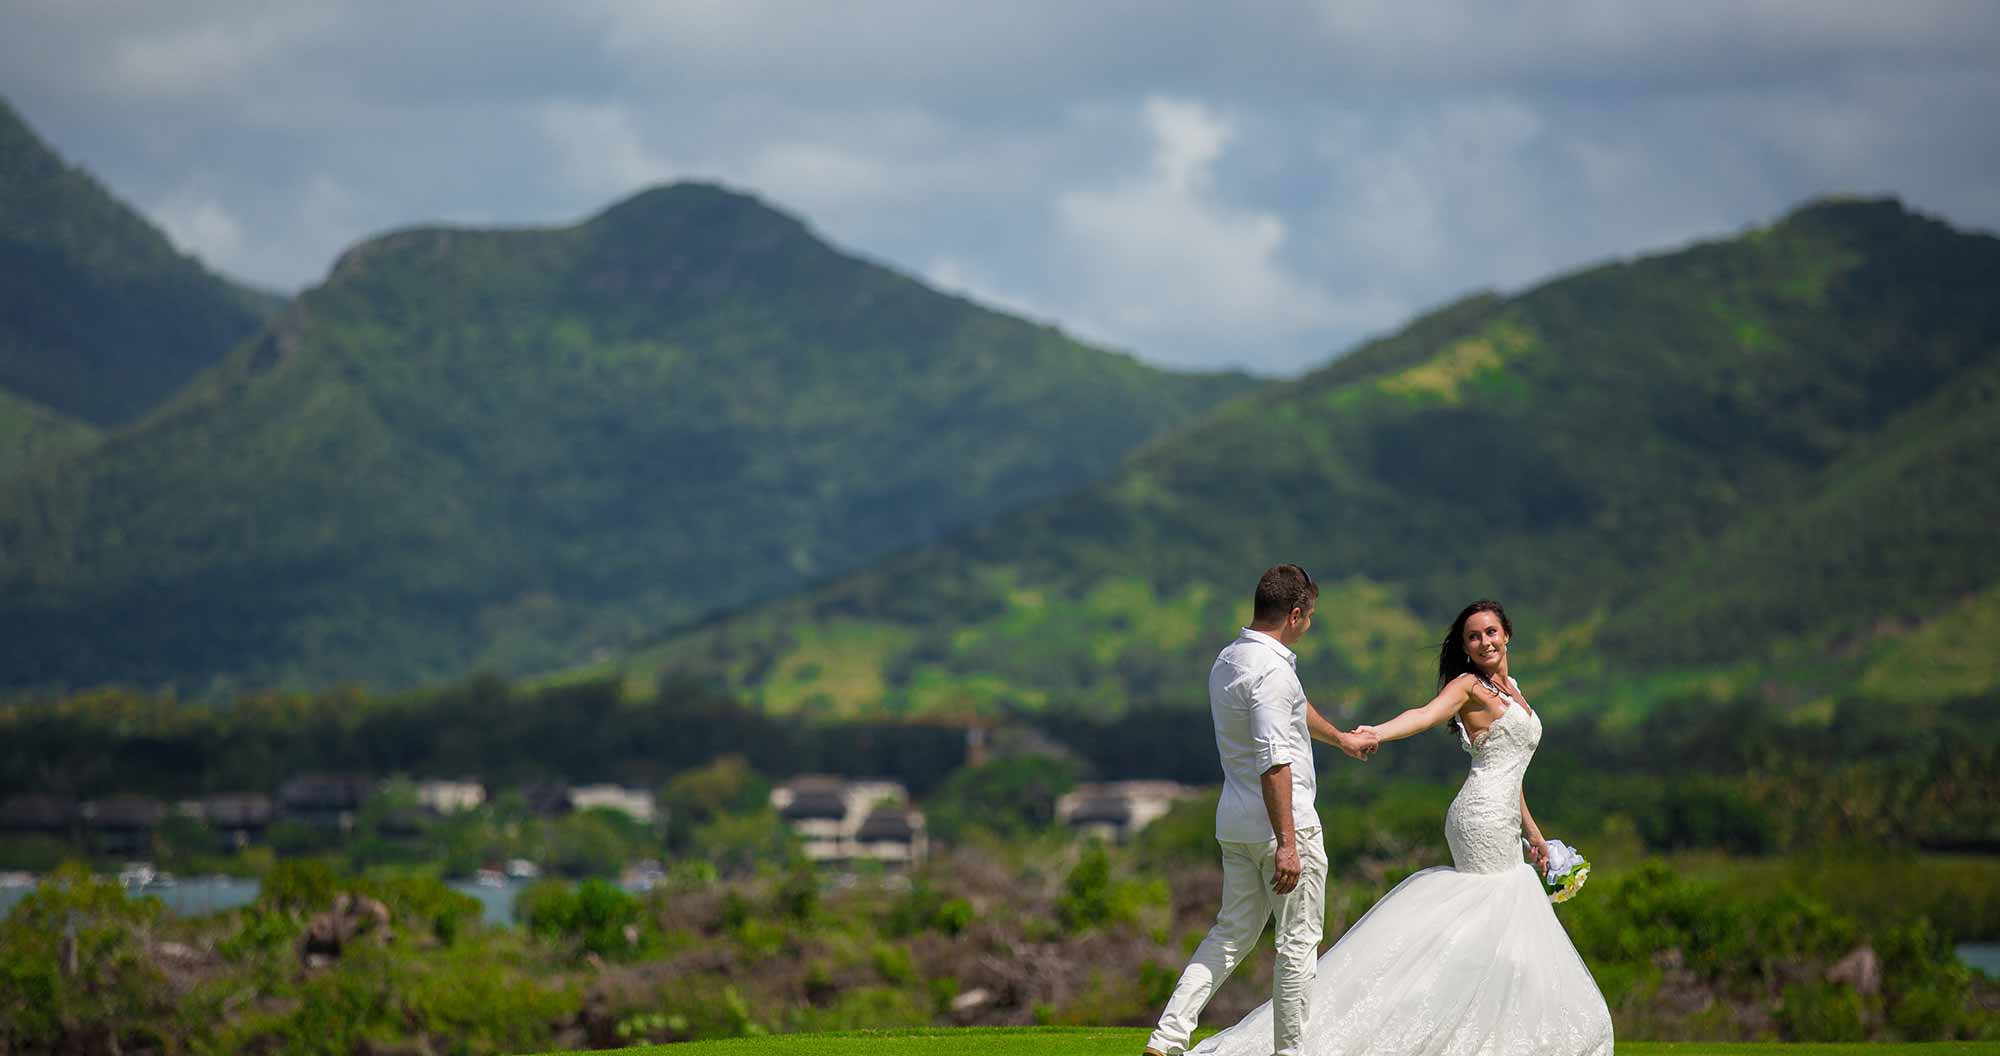 Luxury Honeymoon Travel Destinations | Luxury Honeymoon Tour Packages